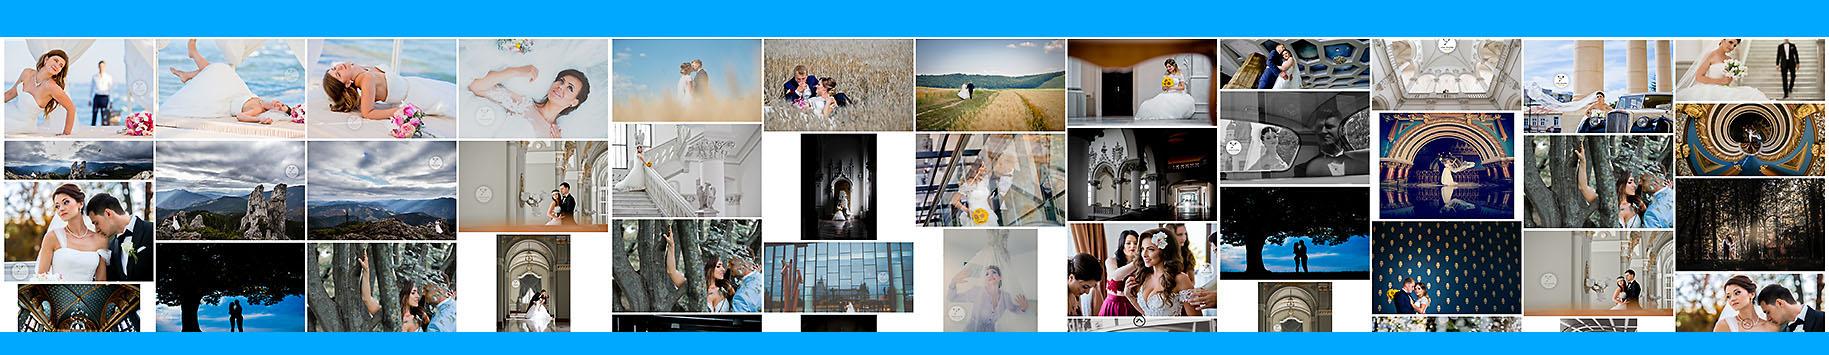 fotograf, album fotocarte, servicii foto botez, fotograf nunta, albume foto, Sedinte foto Iasi, magazin foto, Fotograf profesionist la nunti, Fotograf Iasi, Fotograf profesionist, Fotograf, Fotograf nunta Cristi Timofte, Fotograf nunti, Sedinta foto trash the dress, fotograf profesionist,